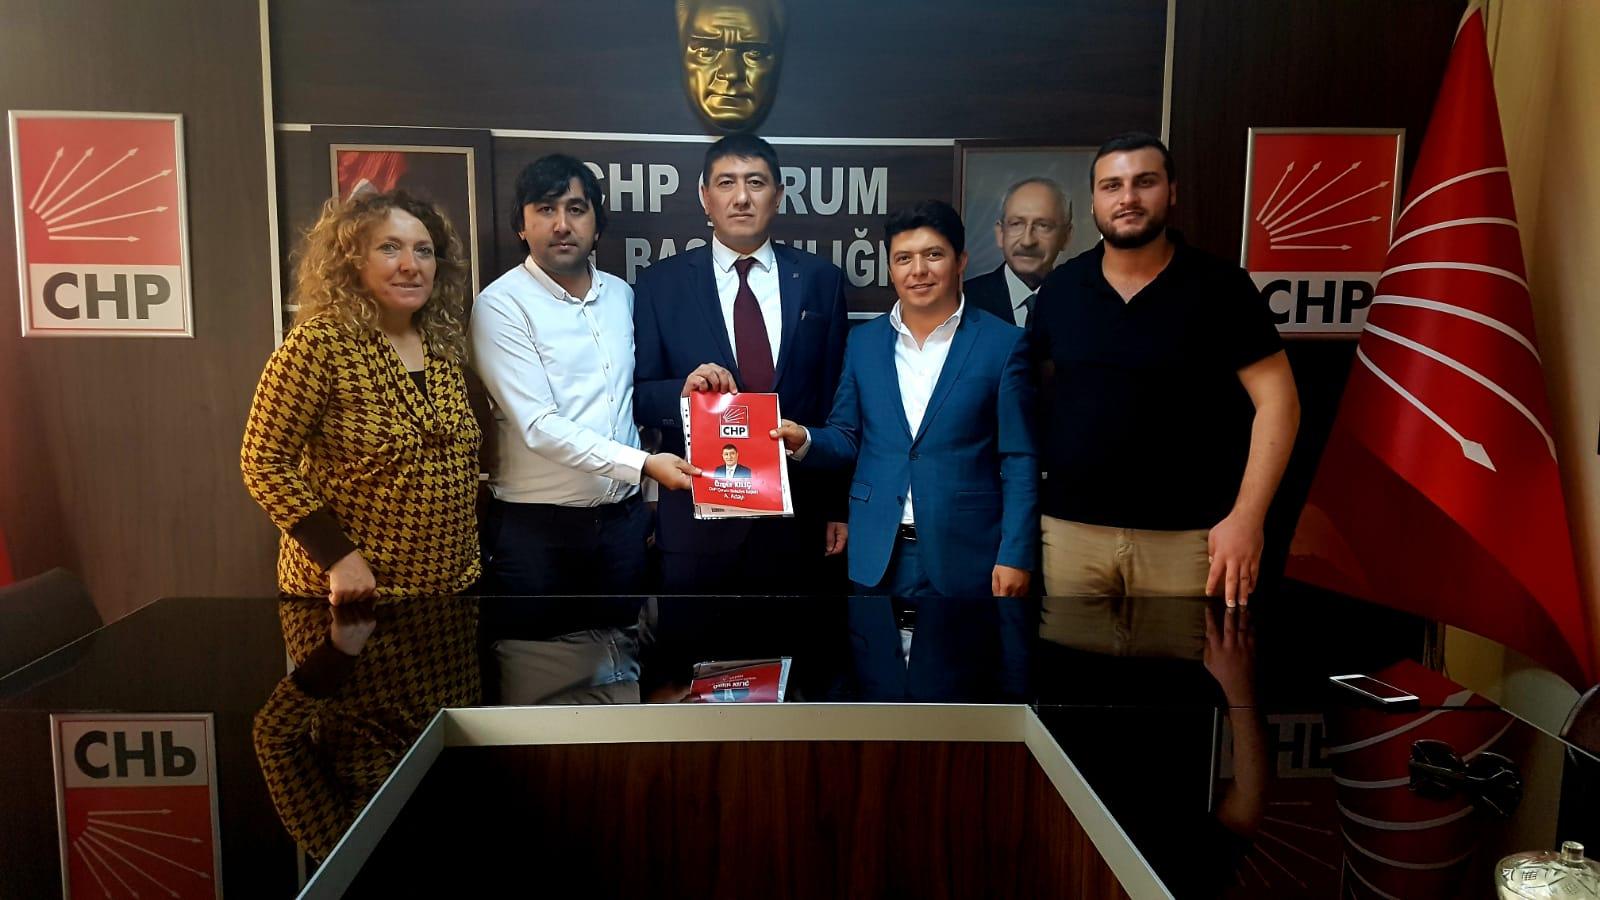 İLK BAŞVURU CHP'DEN